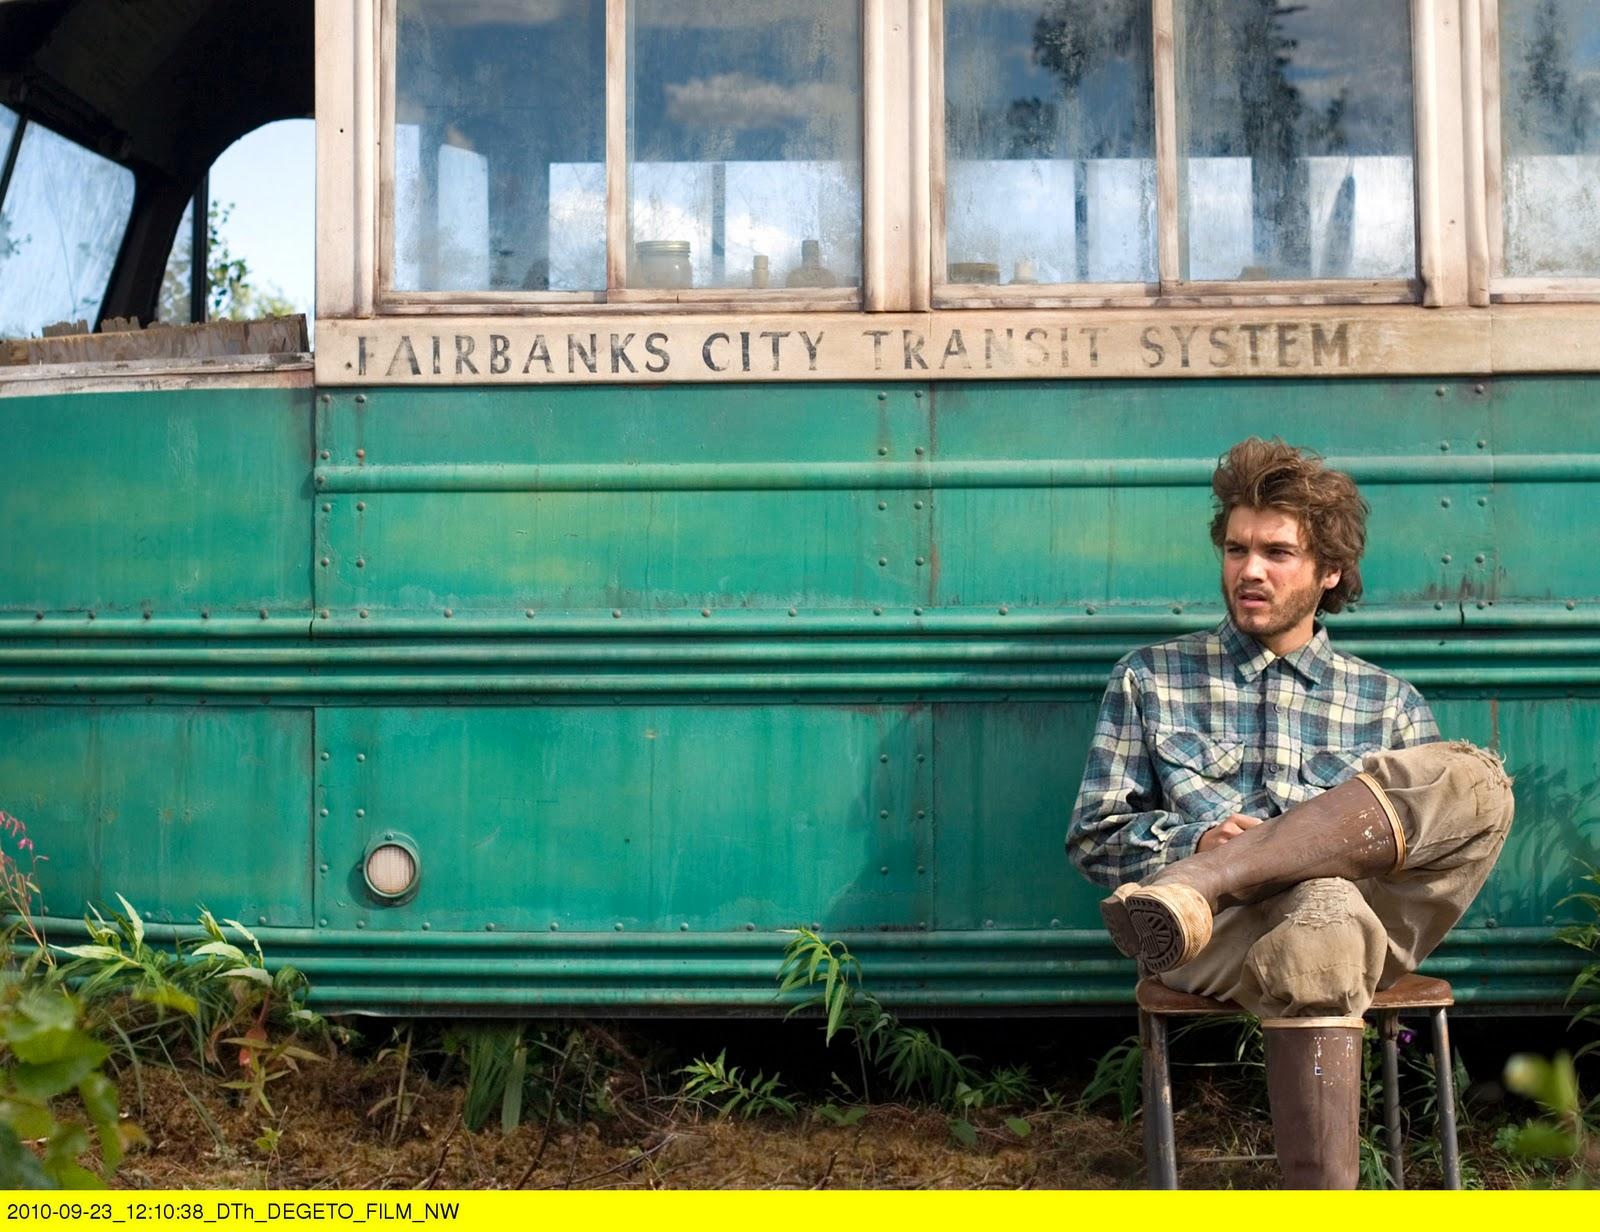 http://4.bp.blogspot.com/-1GQzqoy3EKk/TZtSwwSPEuI/AAAAAAAABC0/ey_v-cXDNWs/s1600/1_Into_the_wild.jpg